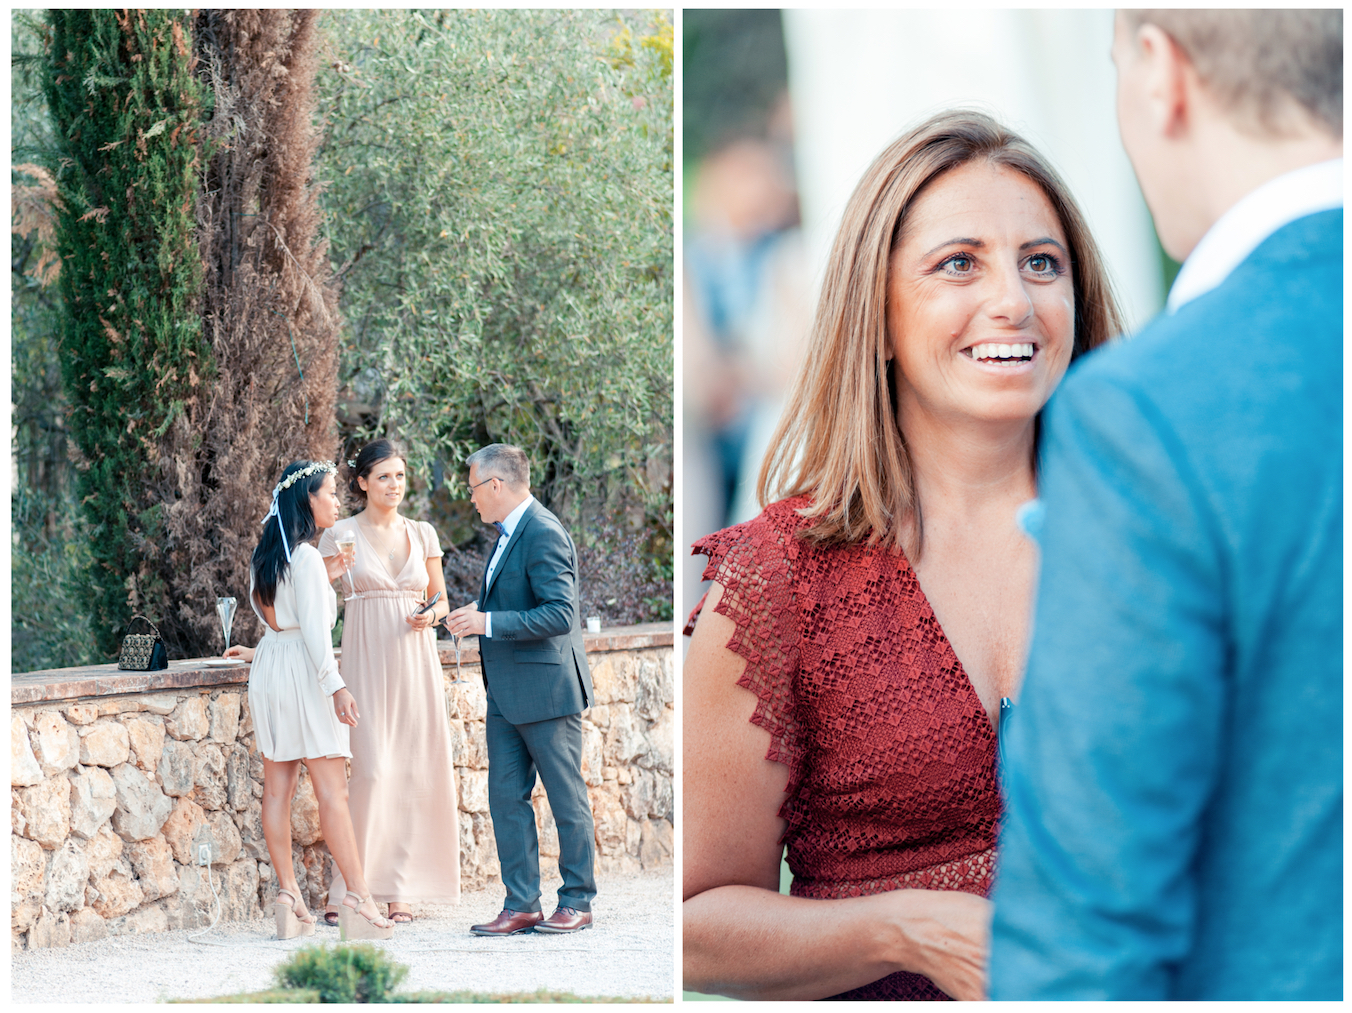 Font-du-Broc-Provence-Wedding-Photographer-06